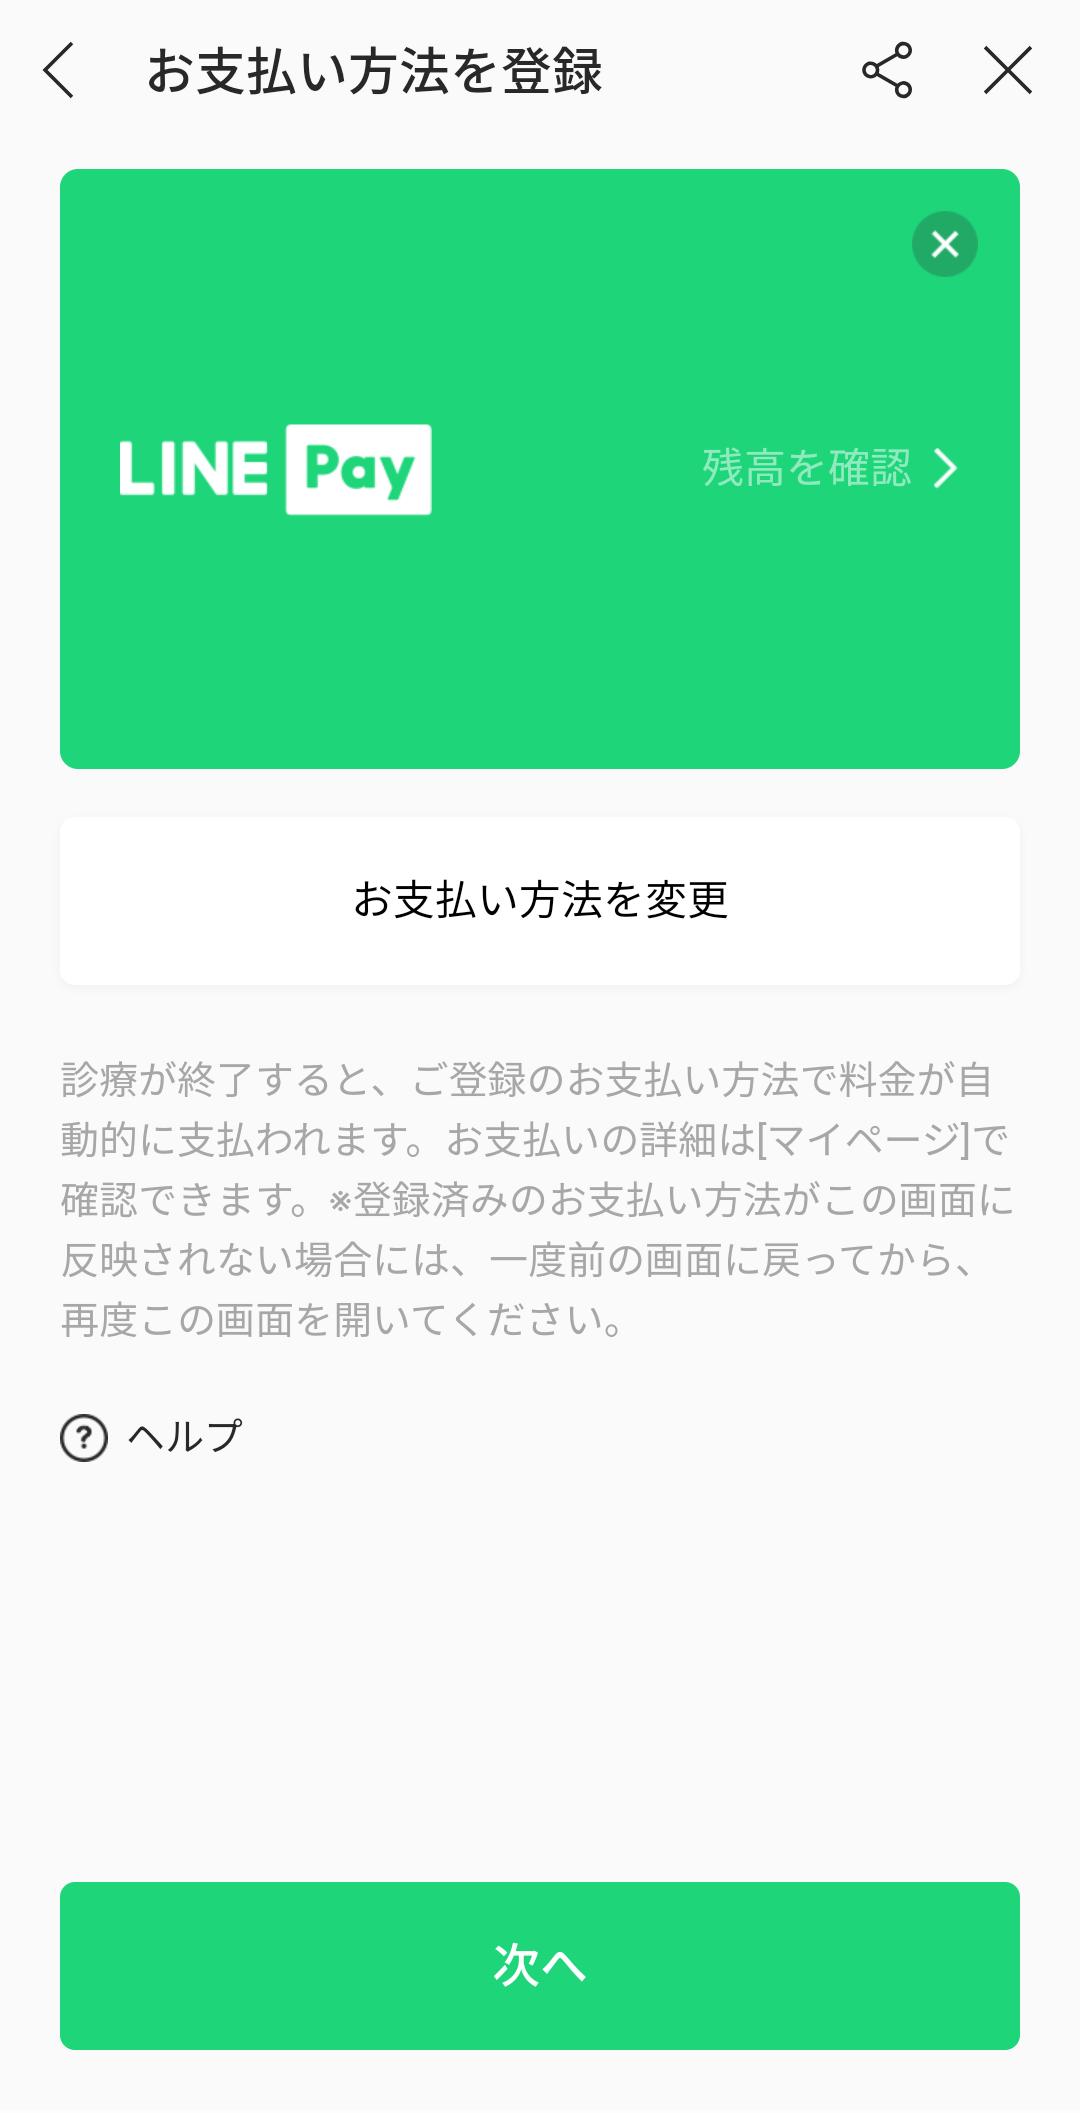 06_Payment_Method